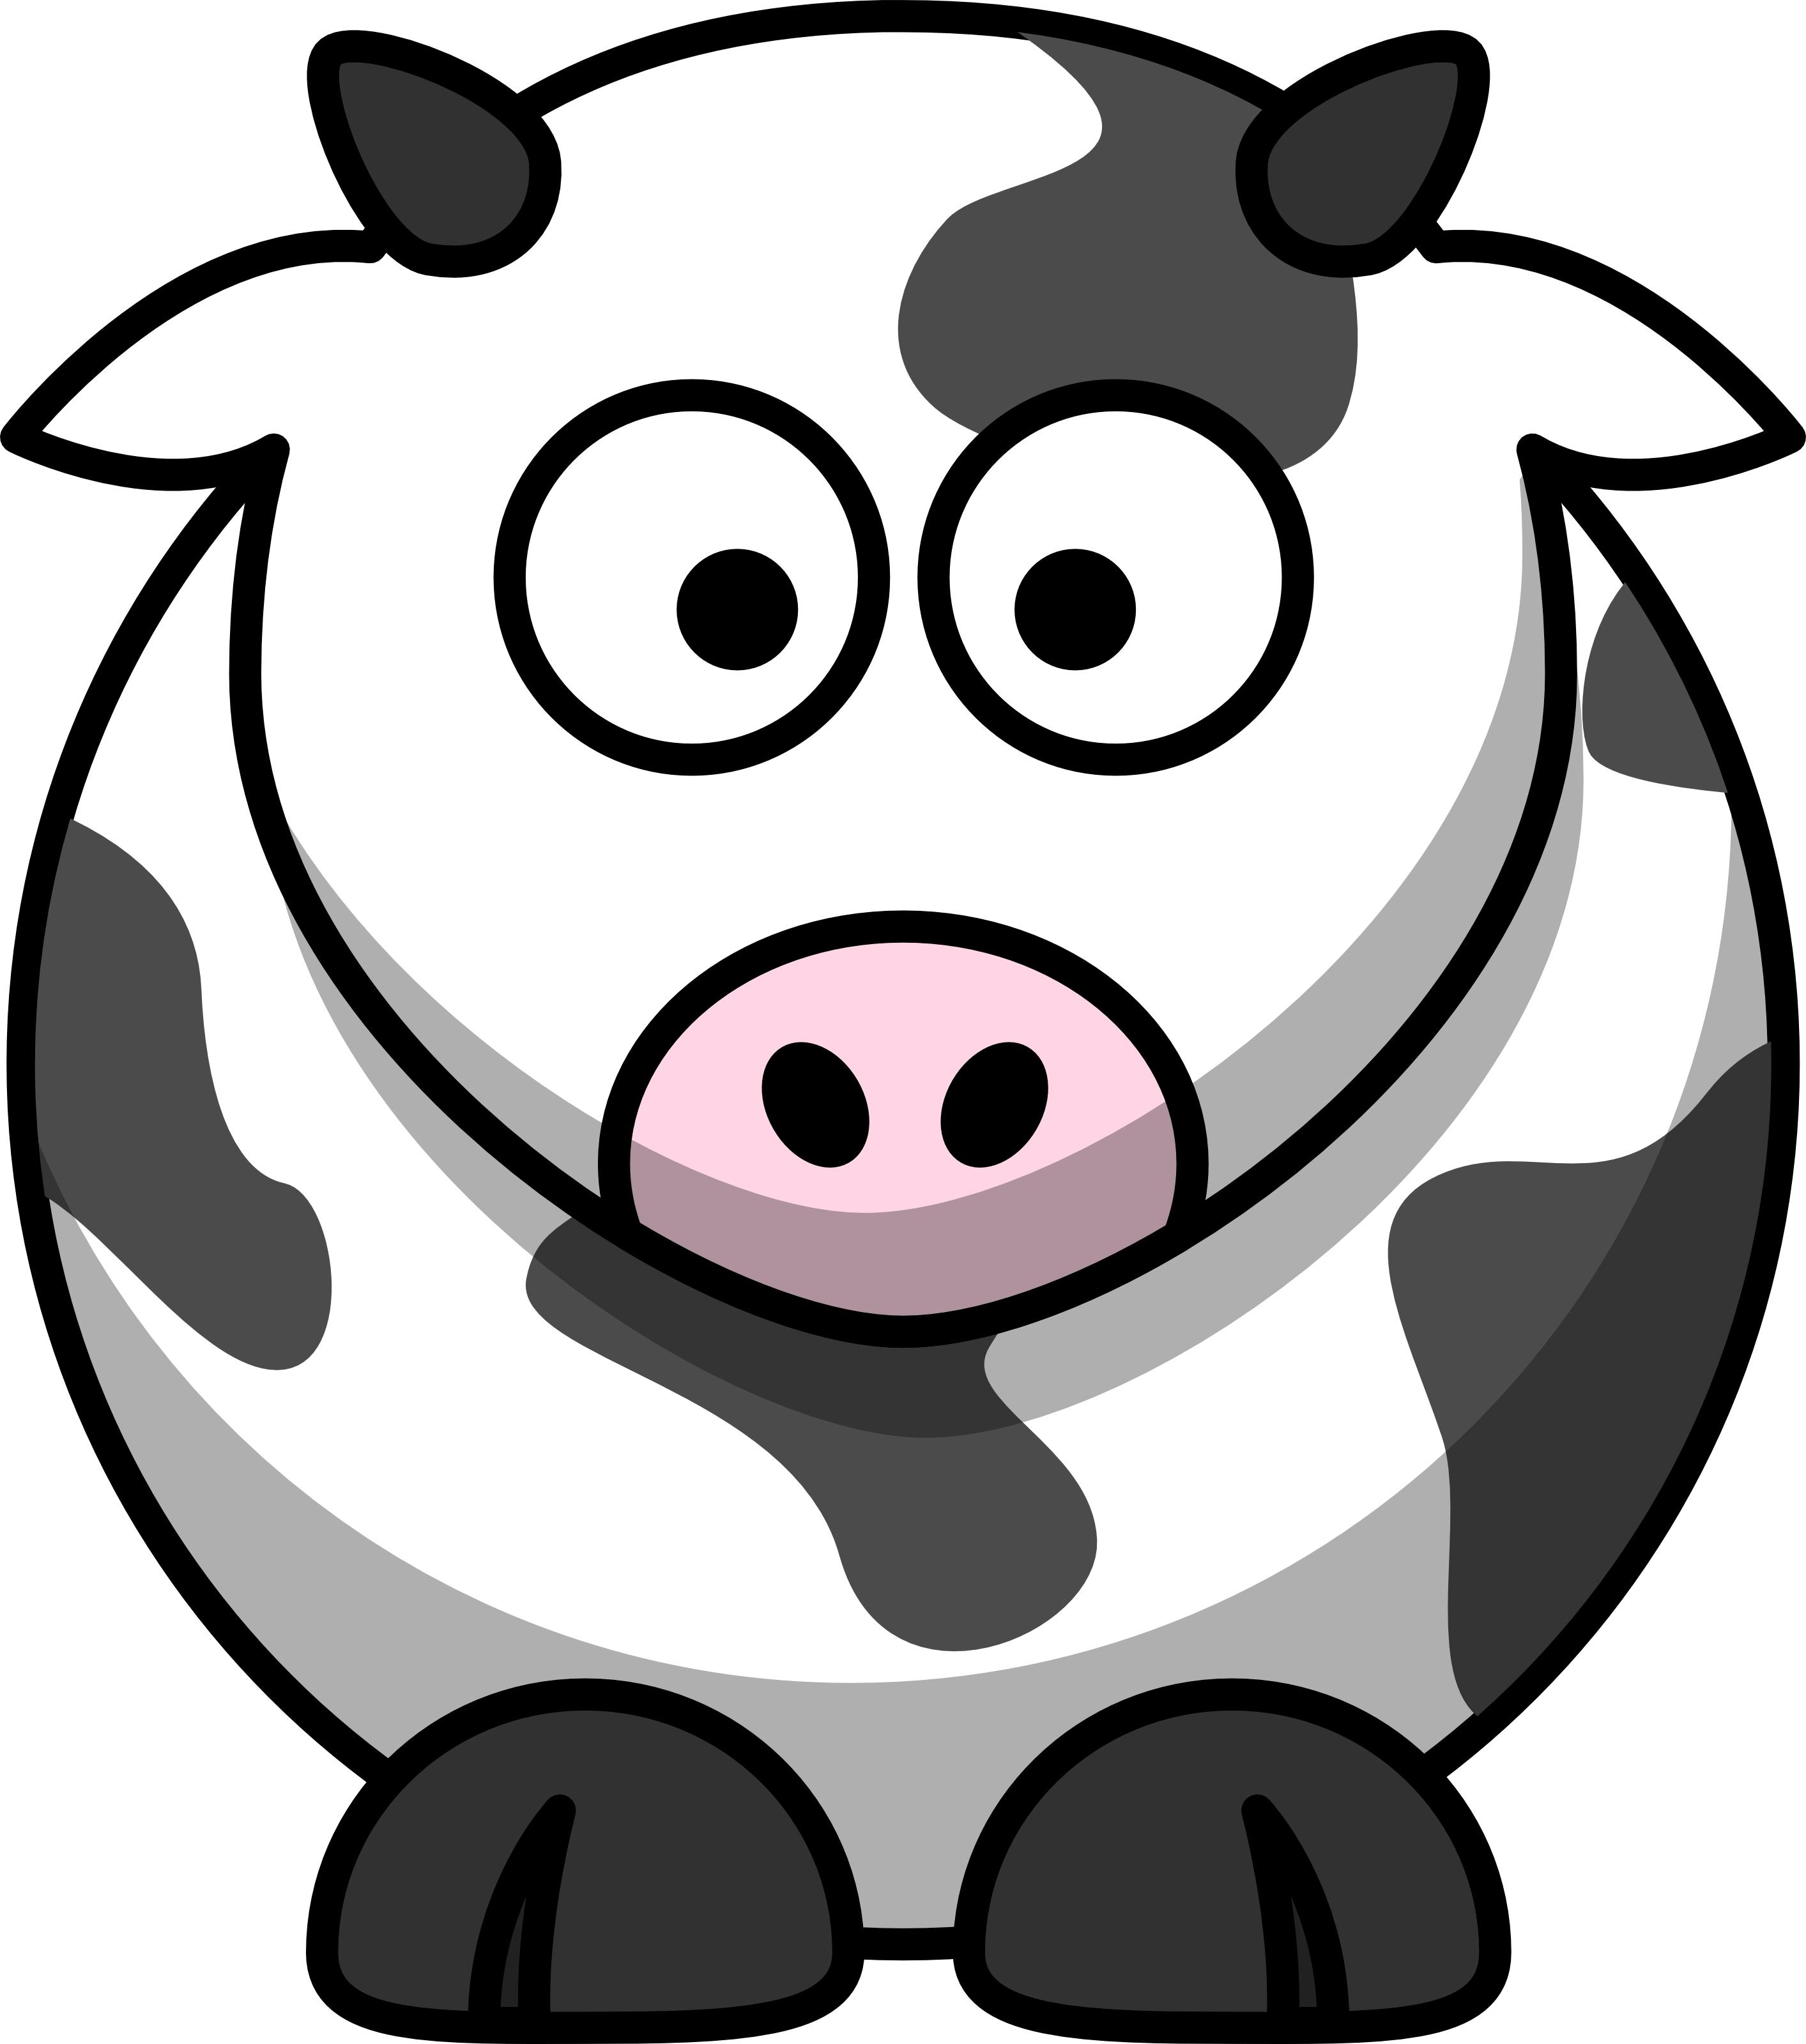 Clipart - Pig, Cow-Clipart - Pig, Cow-10